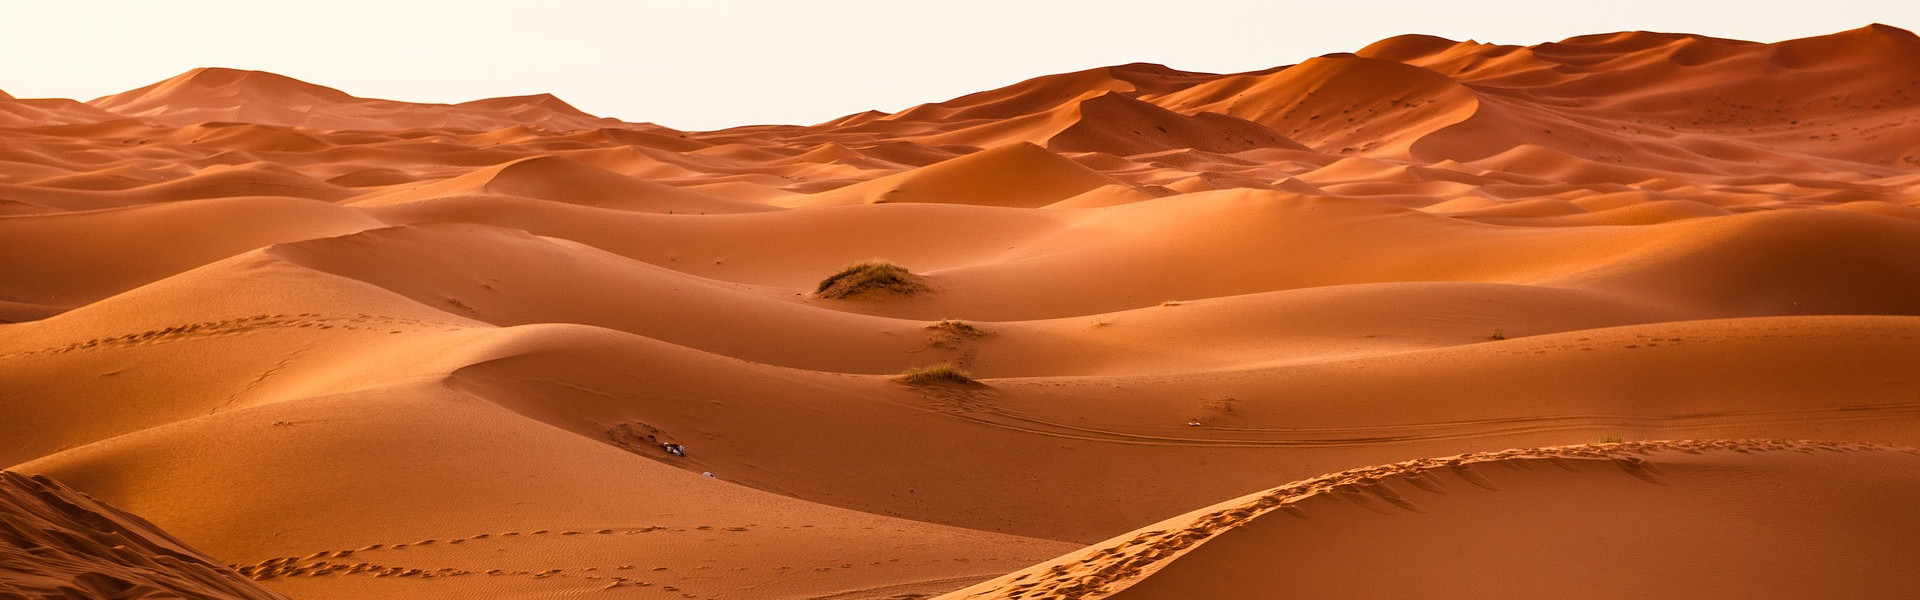 Destination image of Maghreb